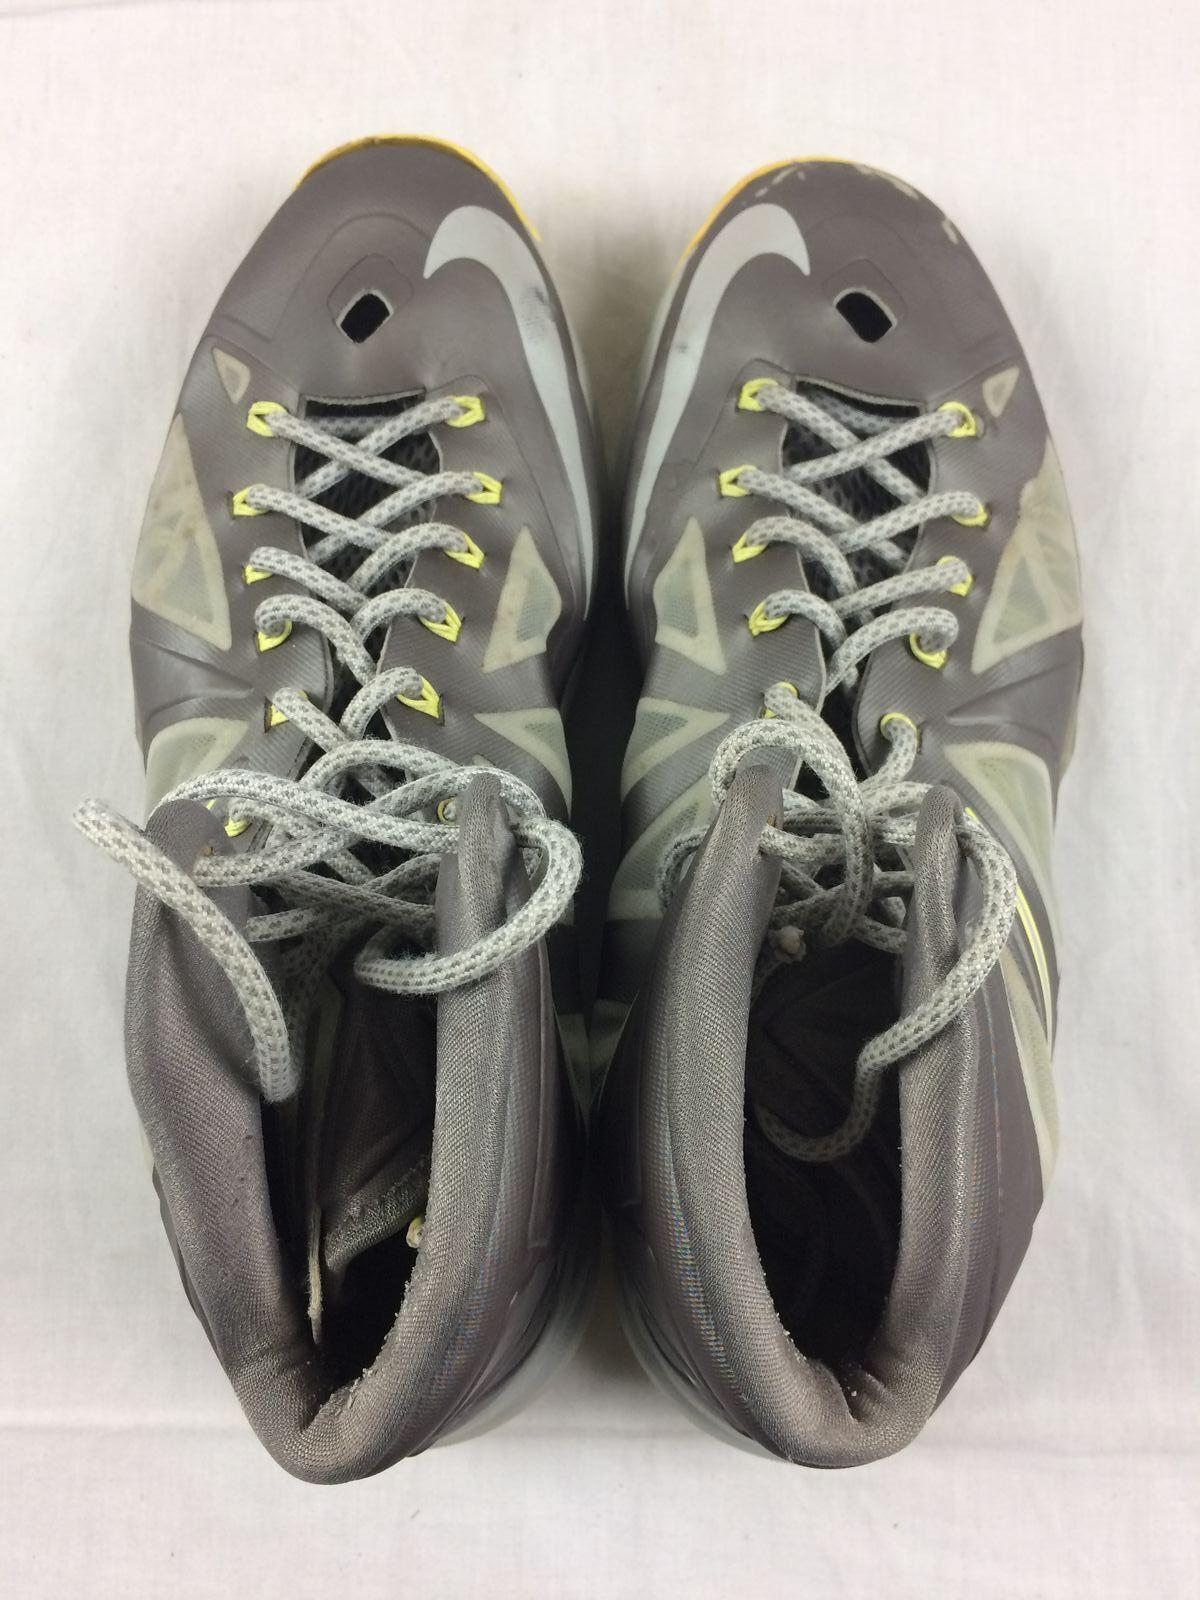 Nike lebron x 10, grau schuhe - gelben basketball - schuhe grau - männer - größe 12 118306